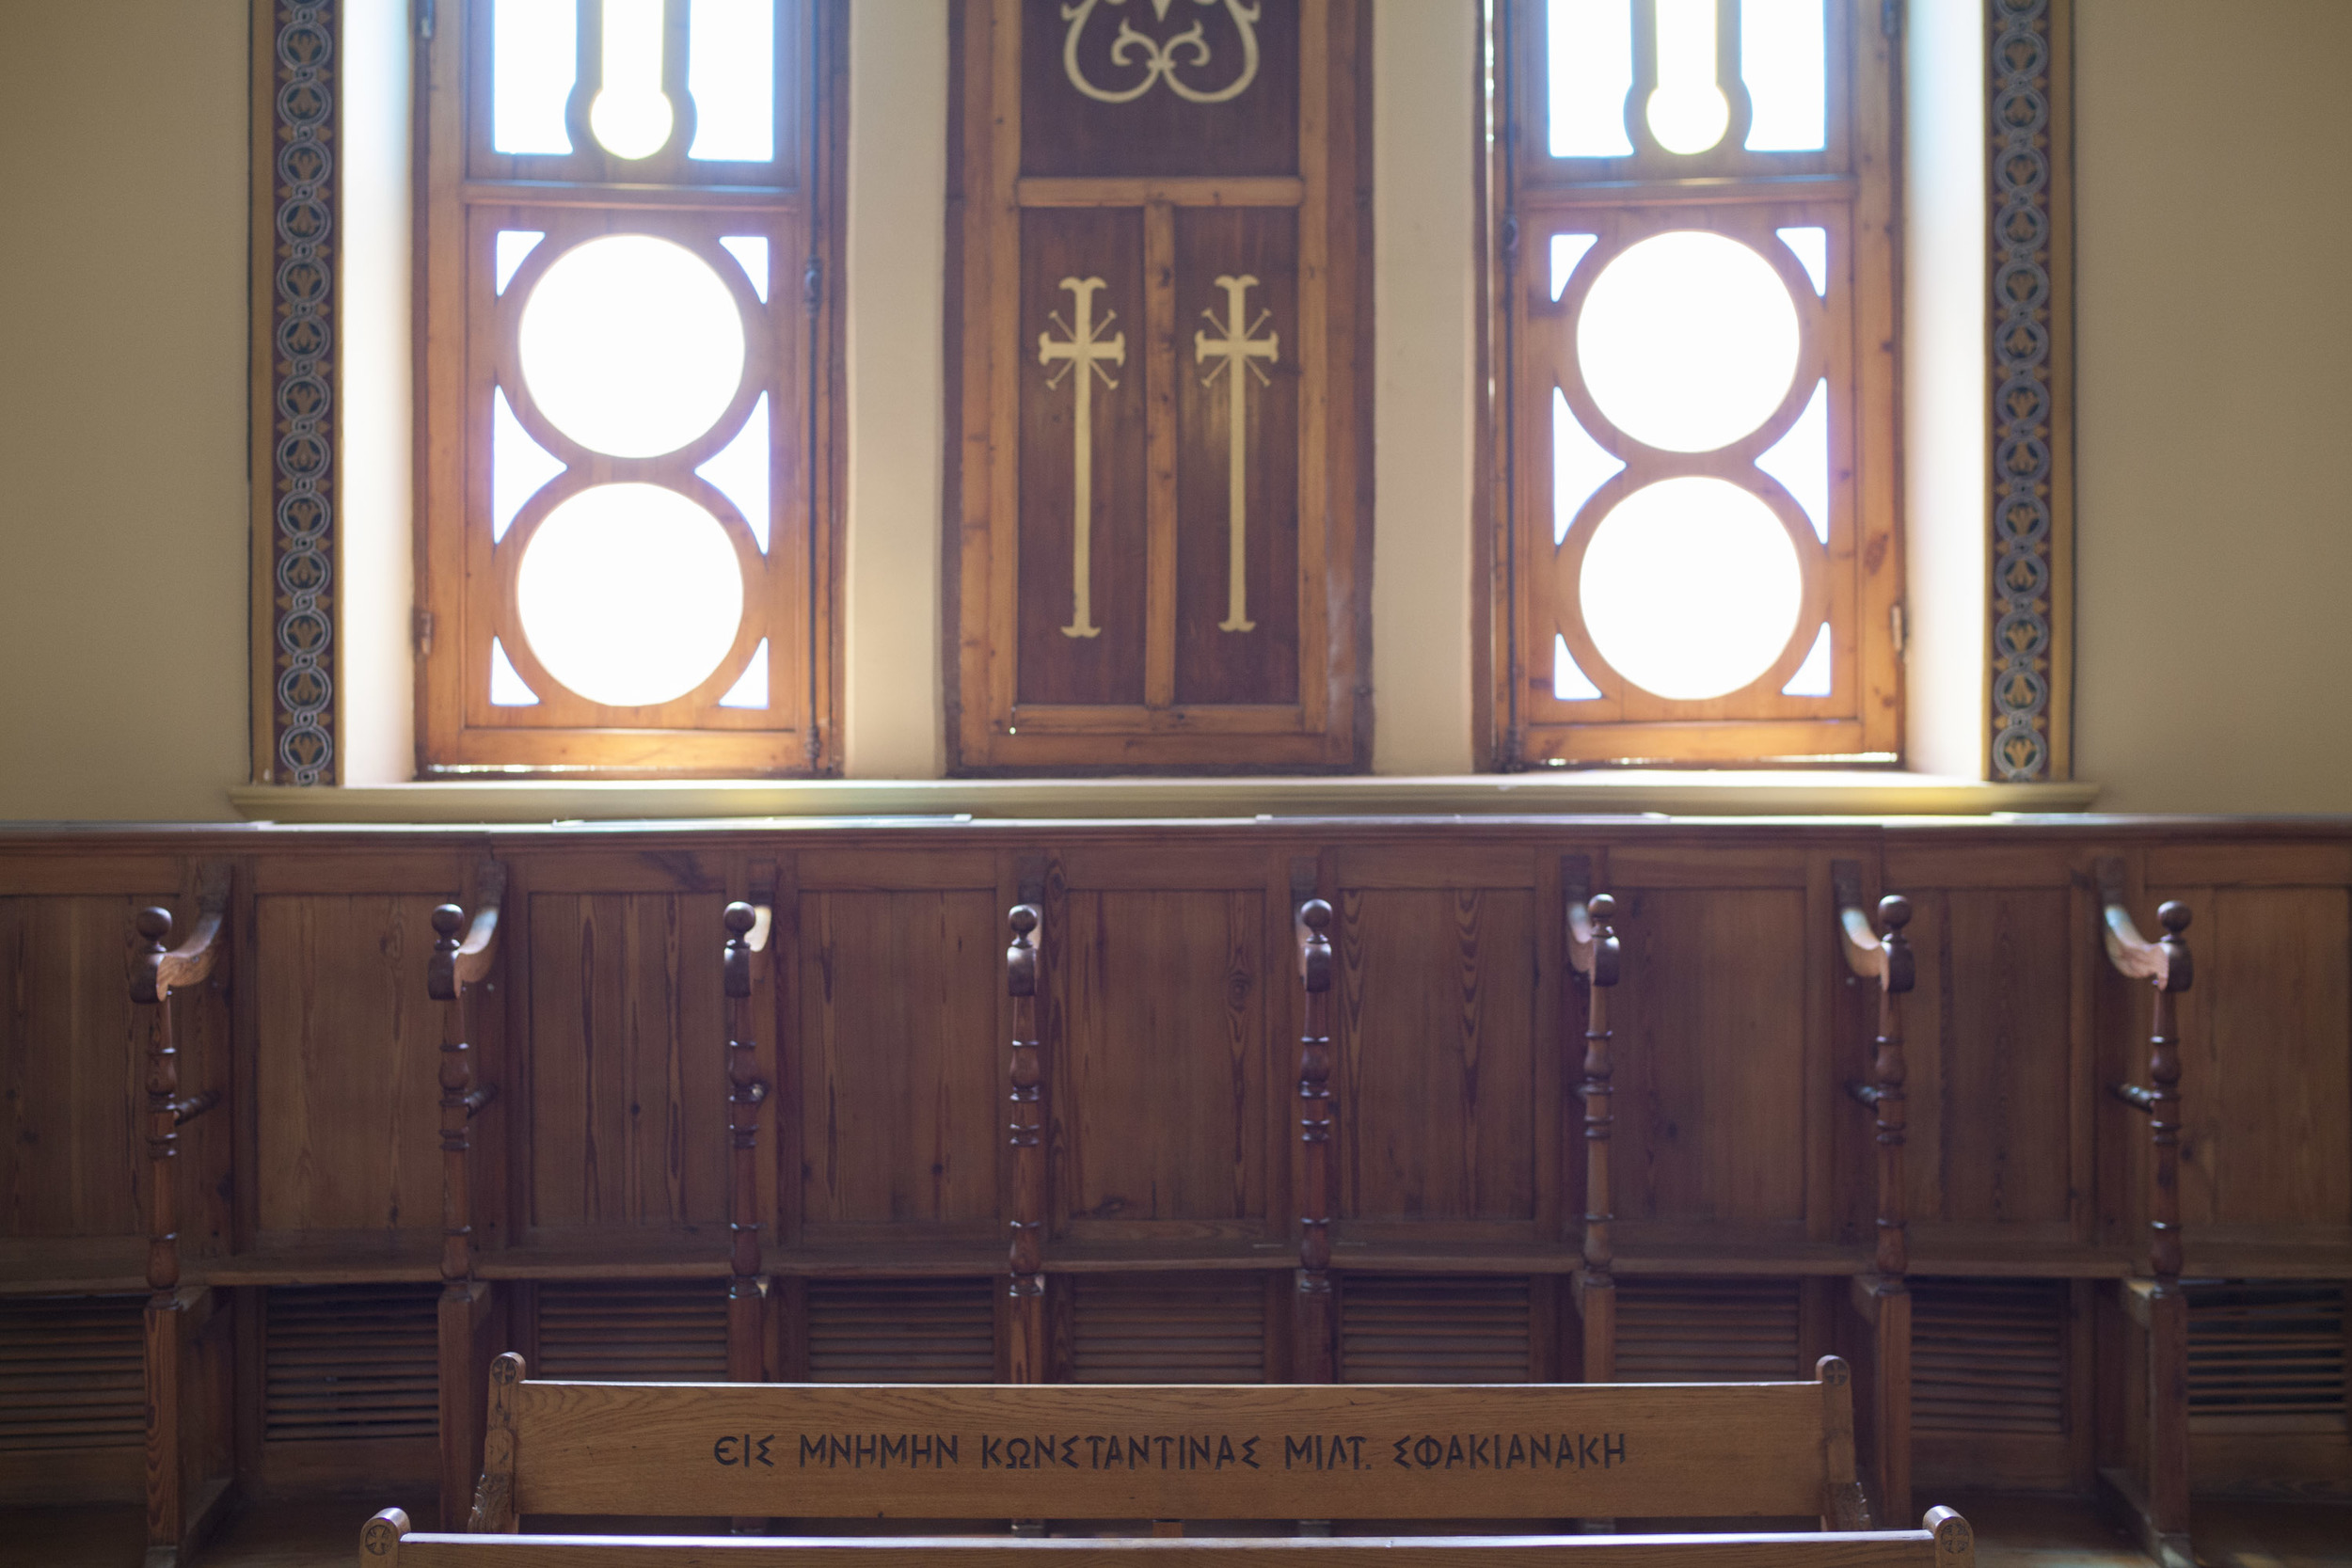 Inside St George coptic church.